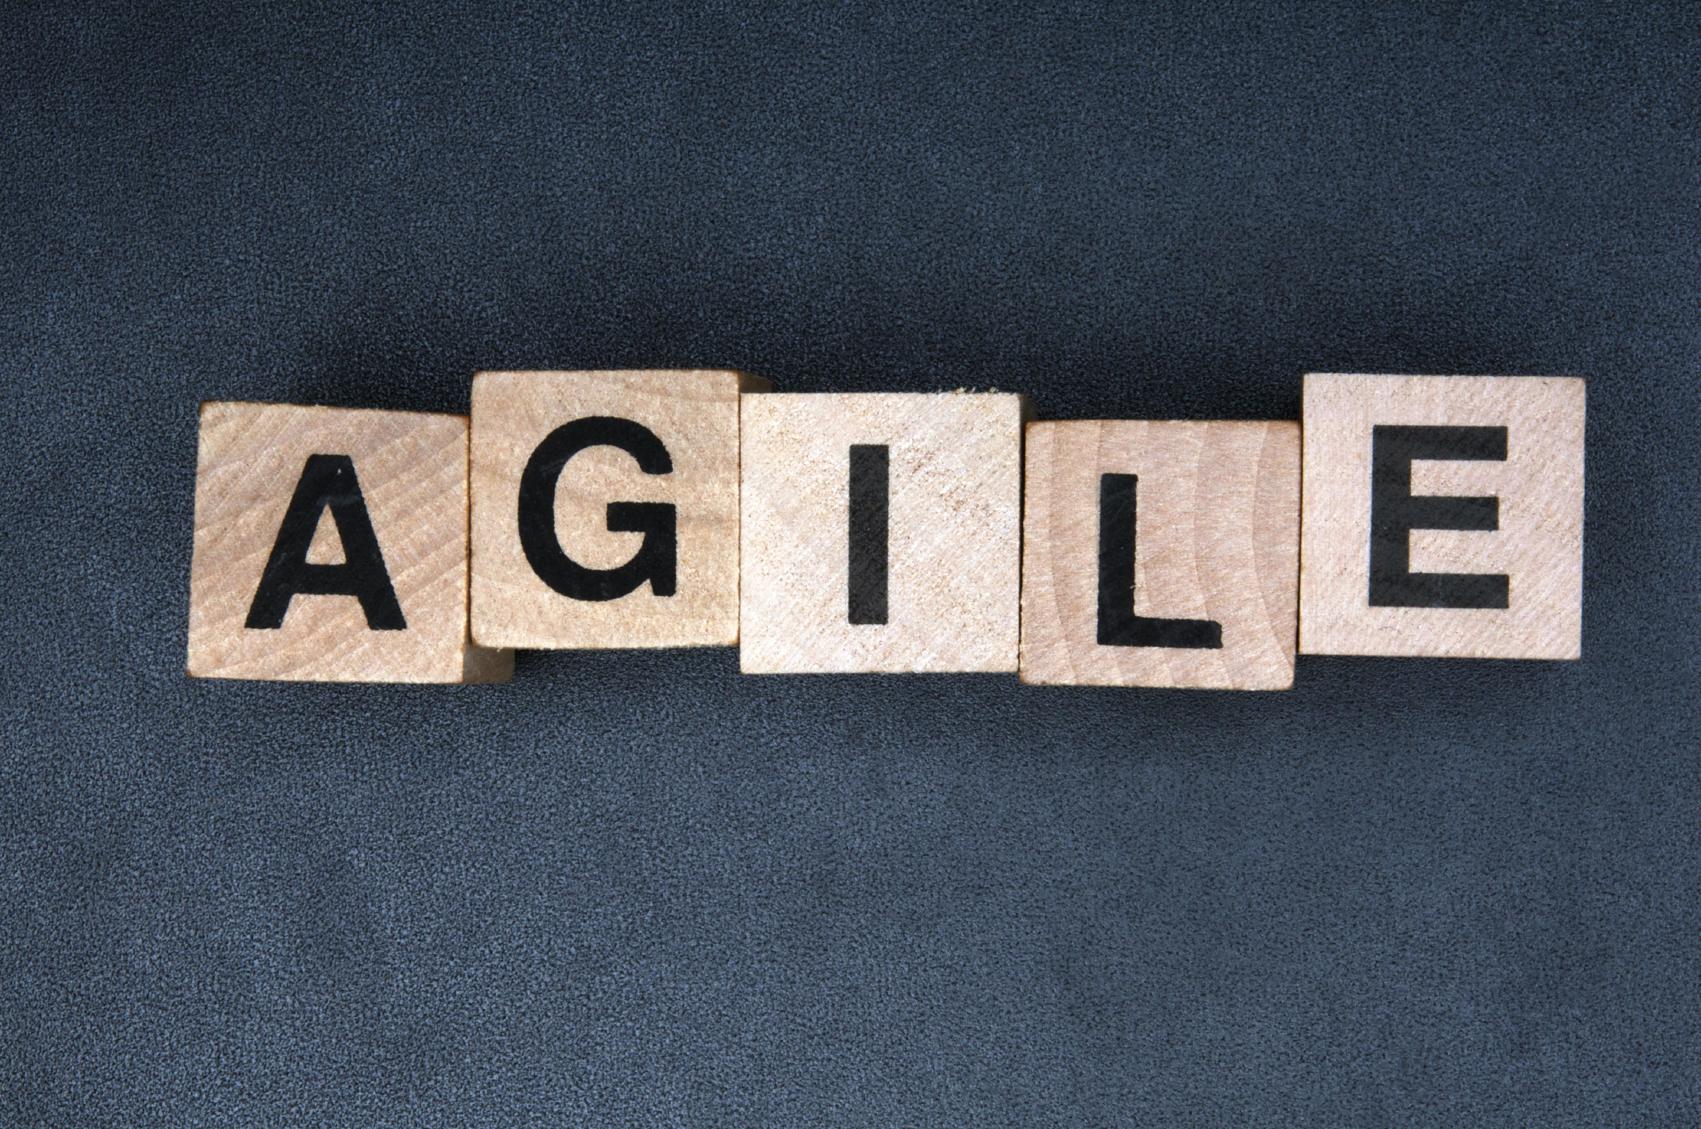 5 Key Benefits Of Agile Methodology